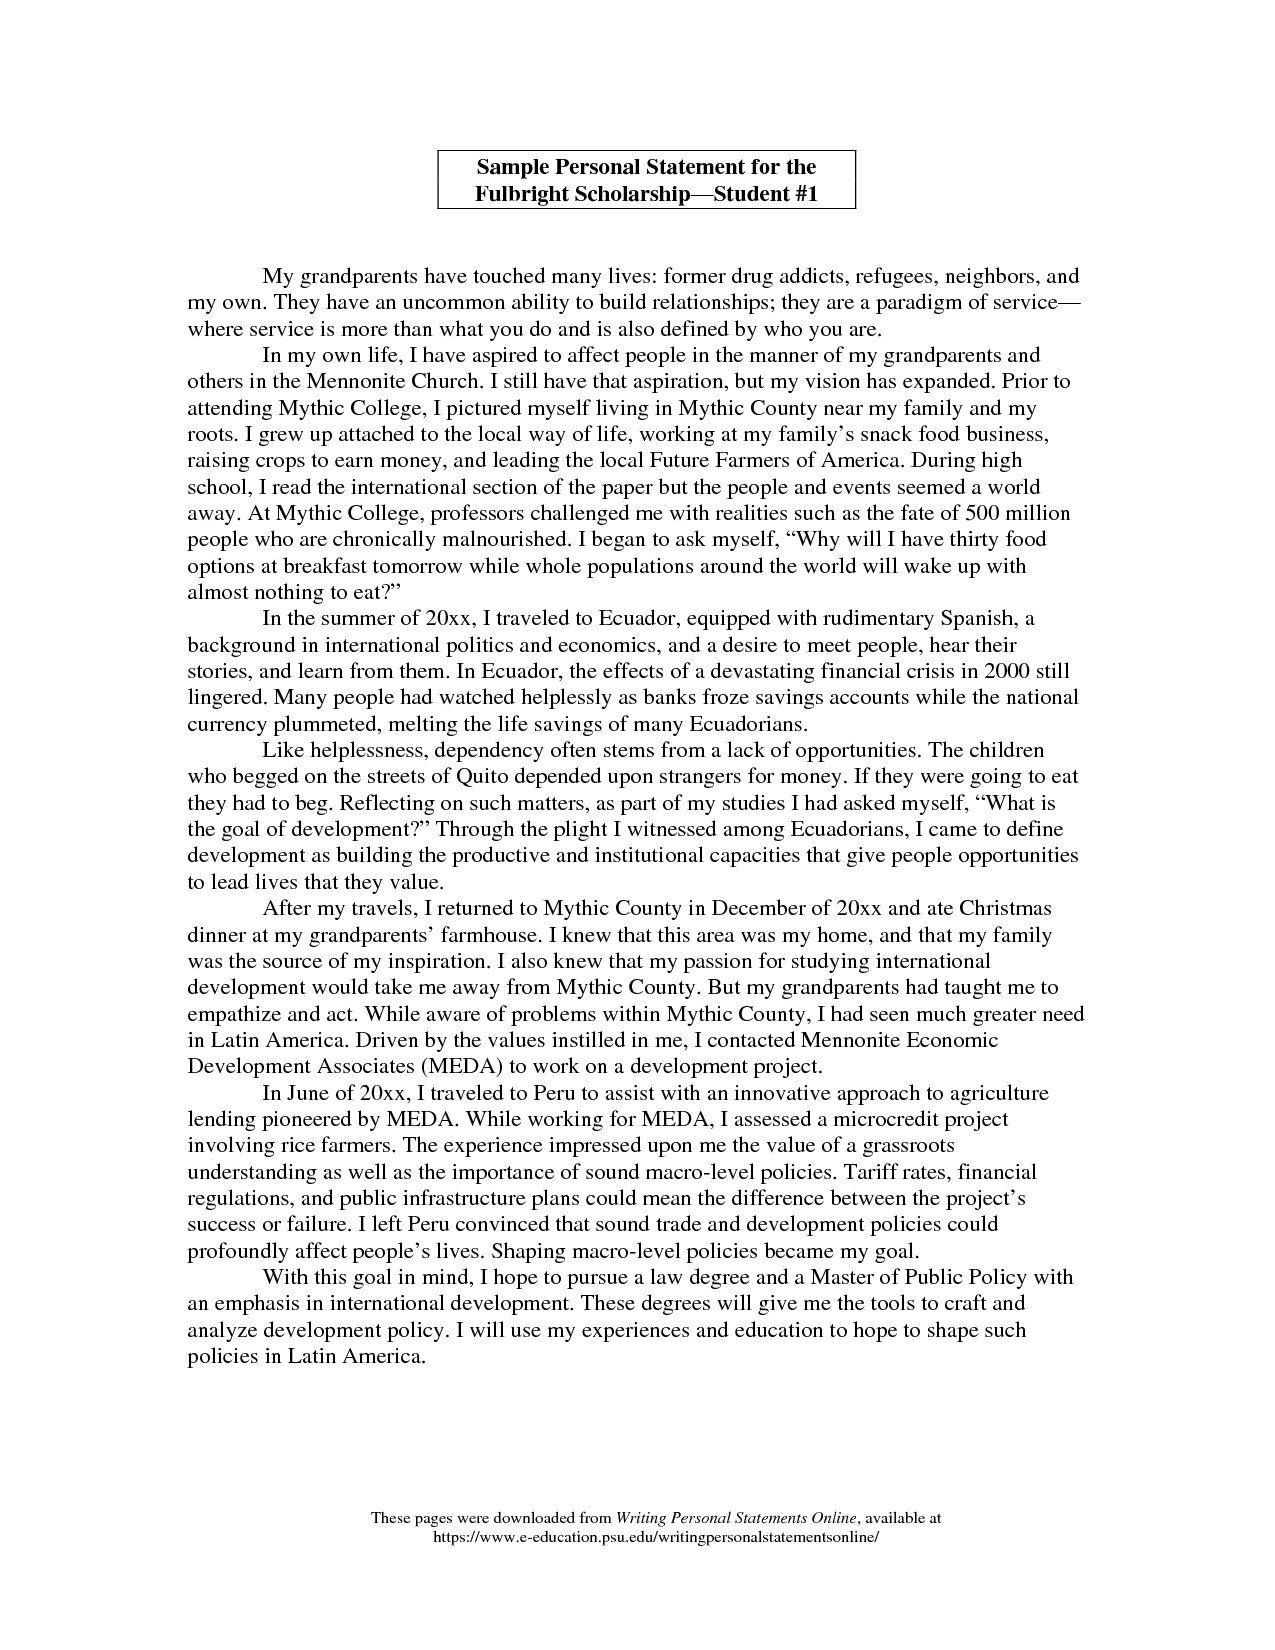 Personal Statement Scholarship Letter The John Marshall